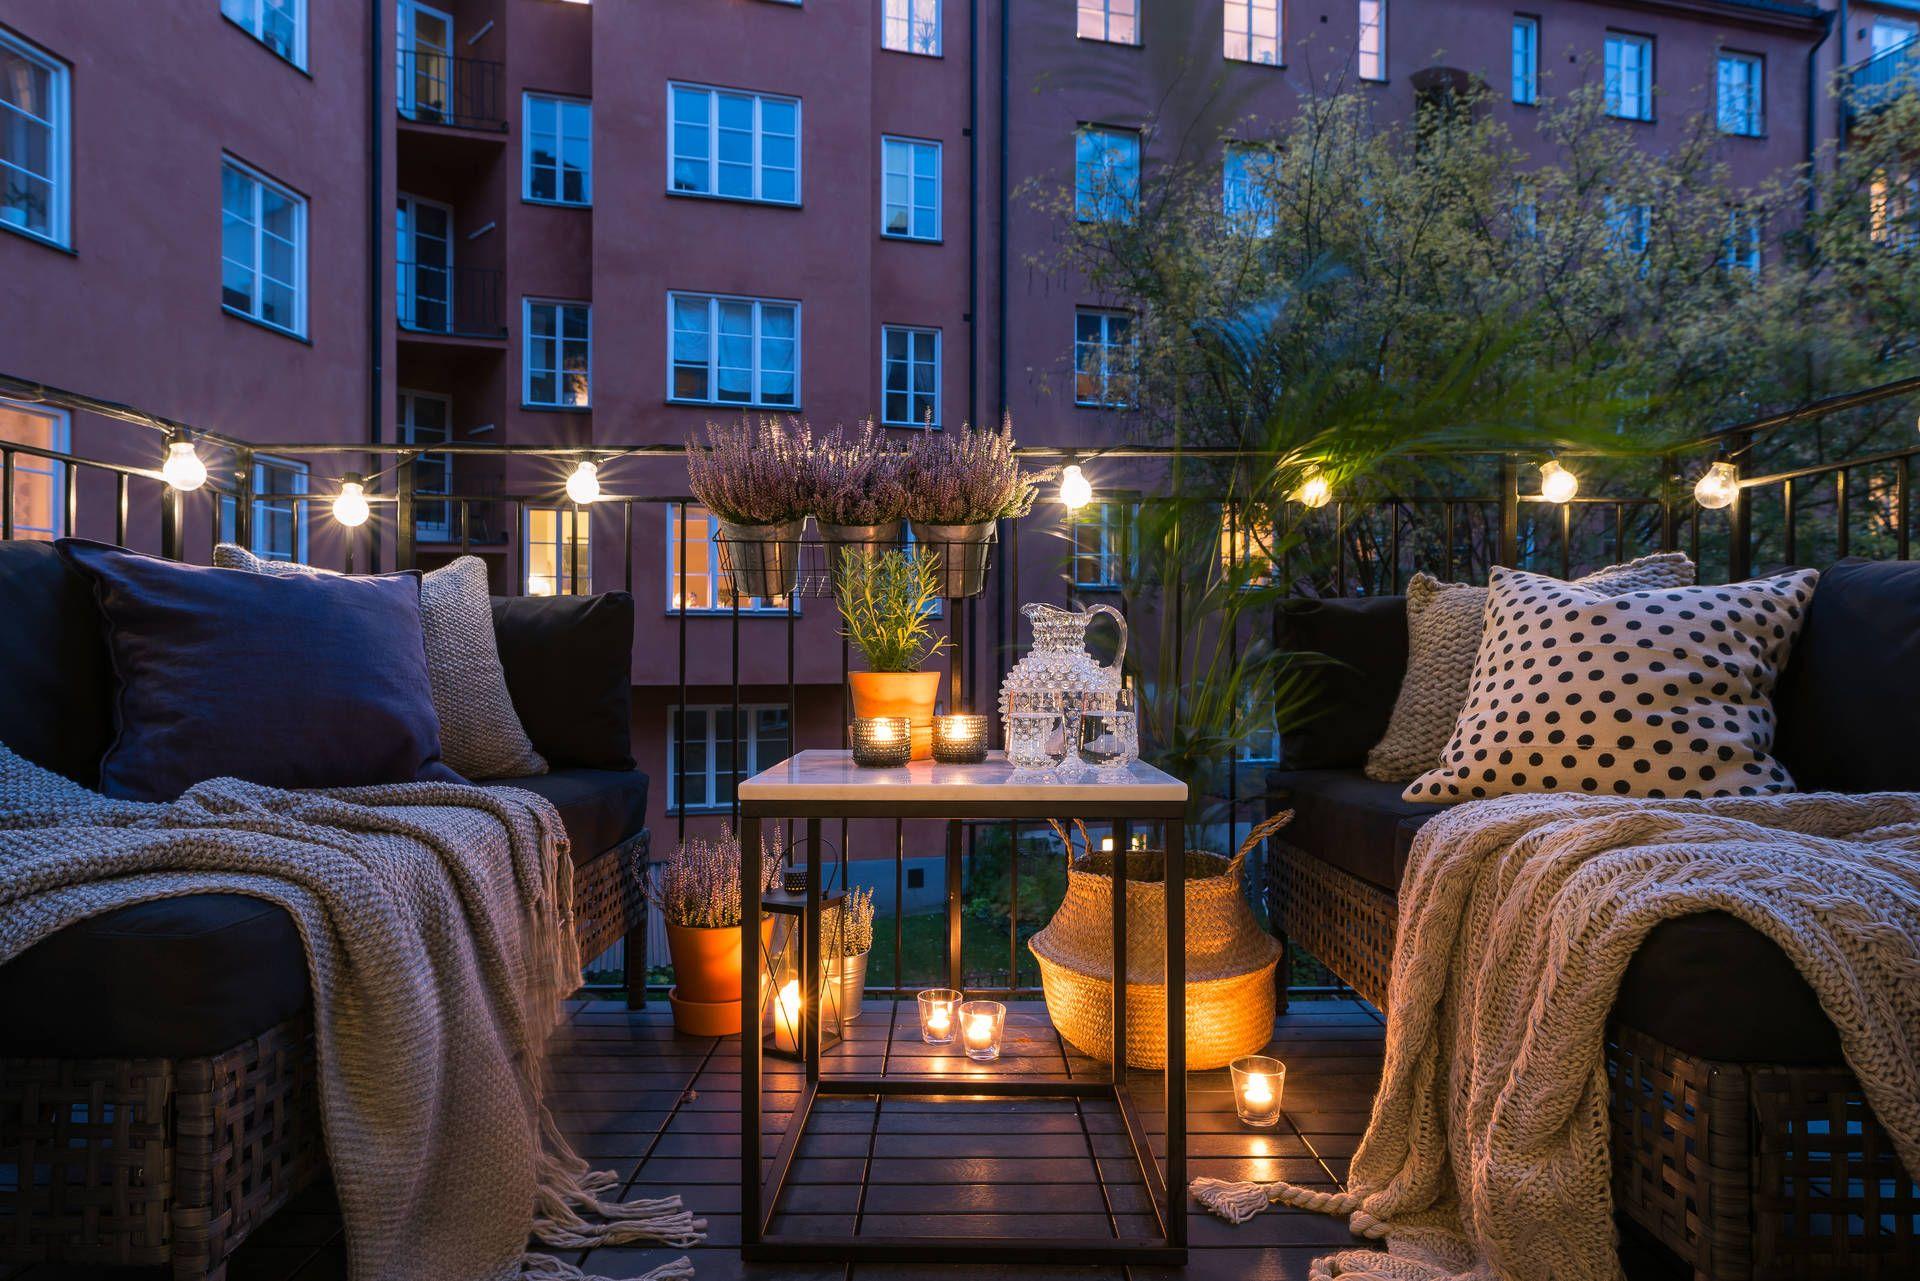 Strands, Balcony Ideas, Stockholm, Balconies, Balcony